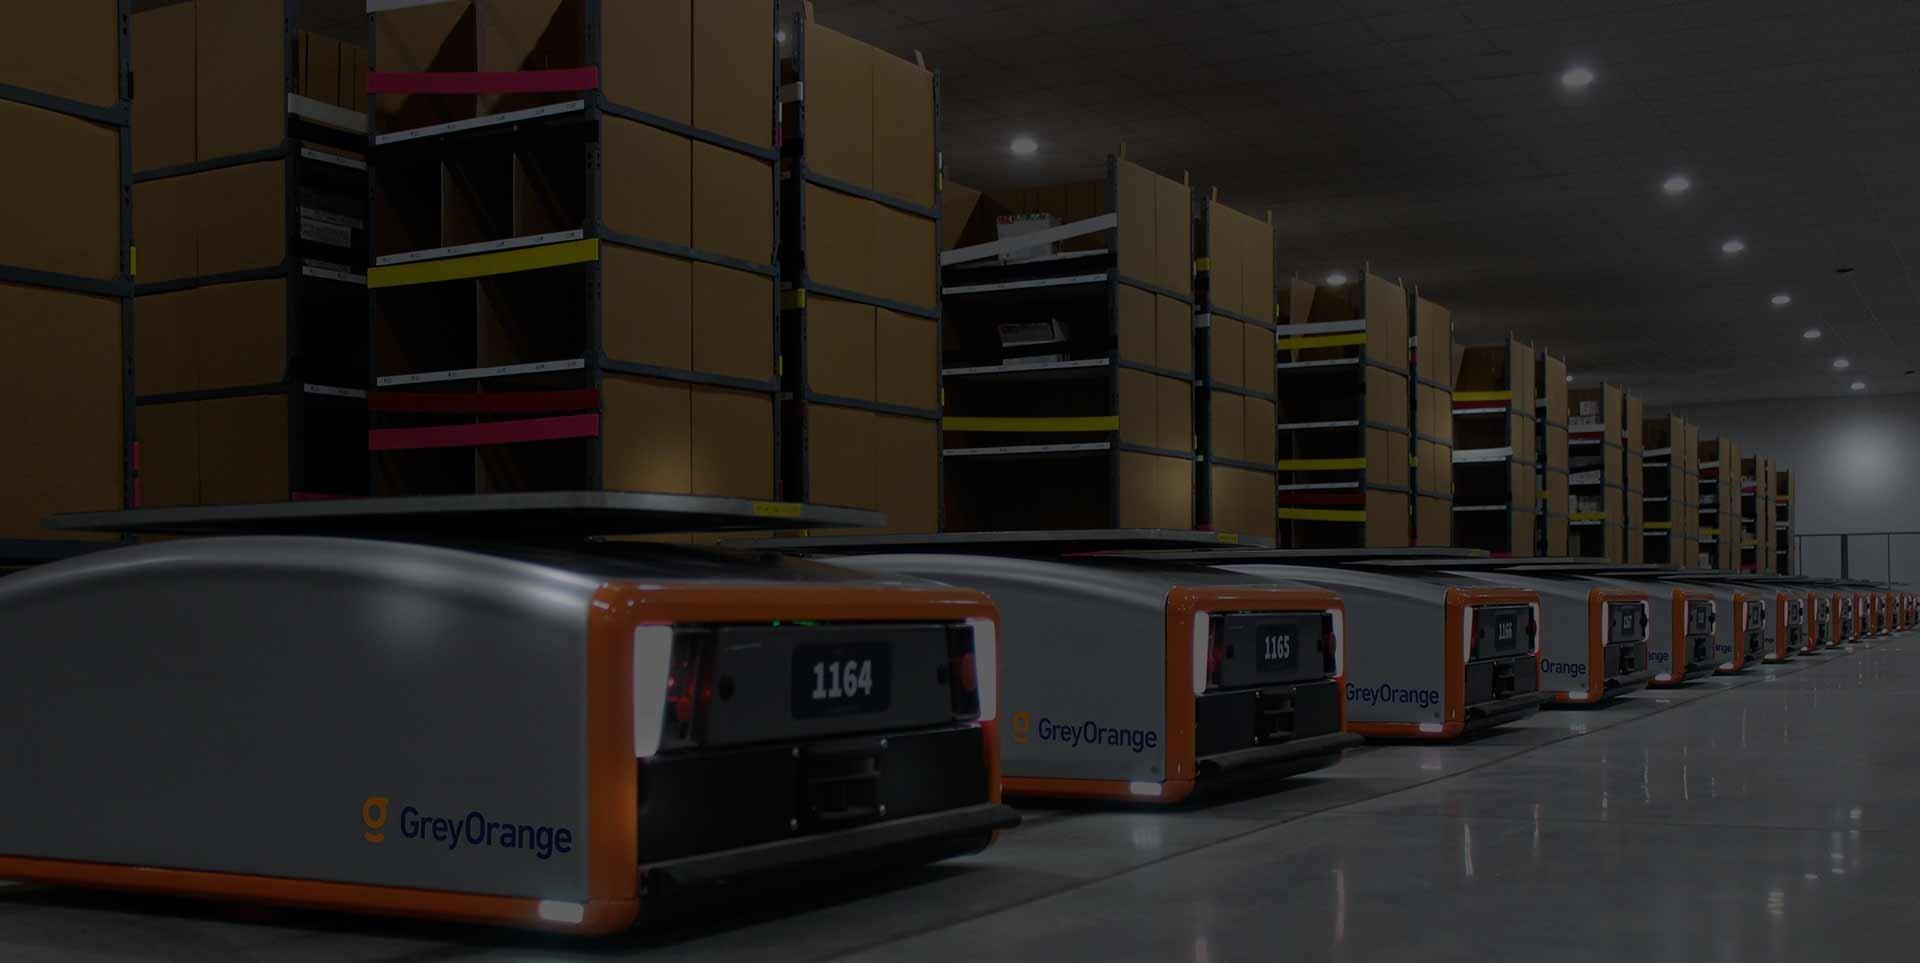 Warehouse-Automation-bg-new.jpg